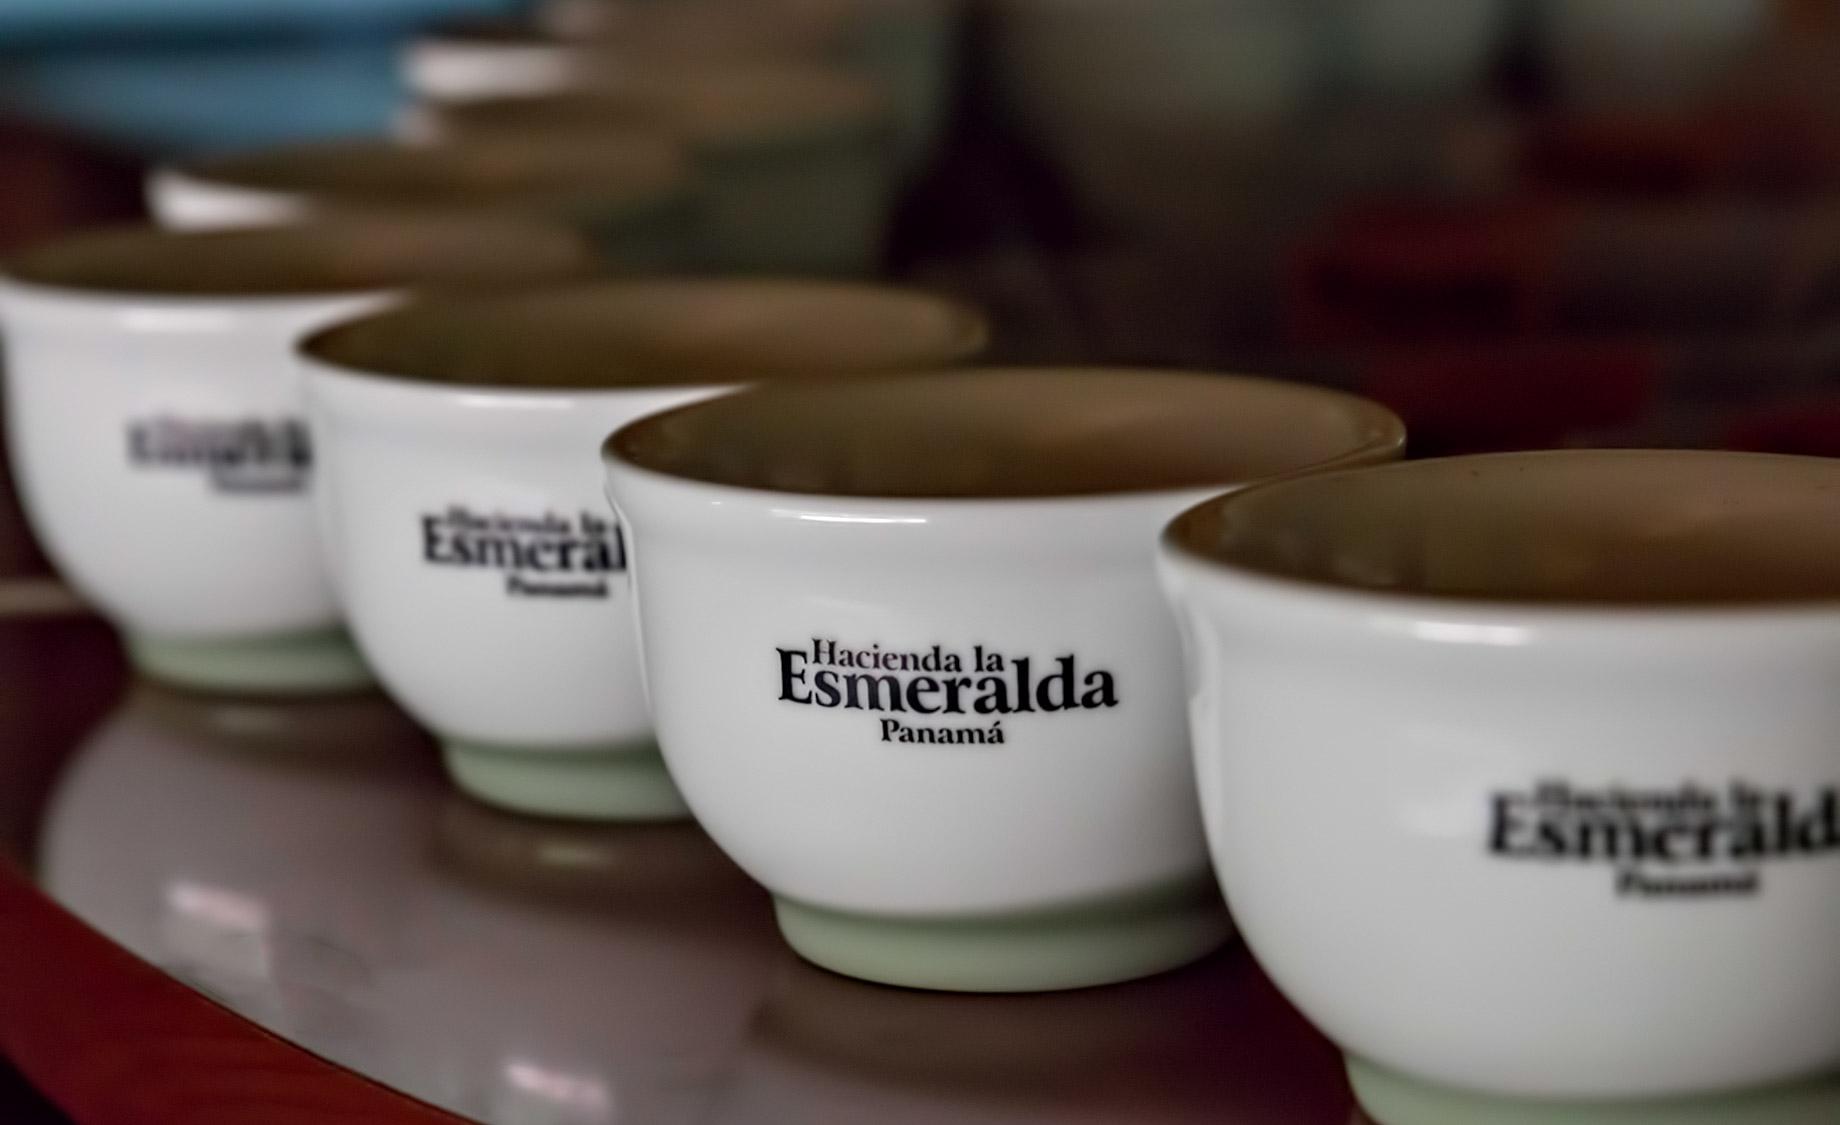 Hacienda La Esmeralda - Panama - One of the Most Expensive Coffees in the World